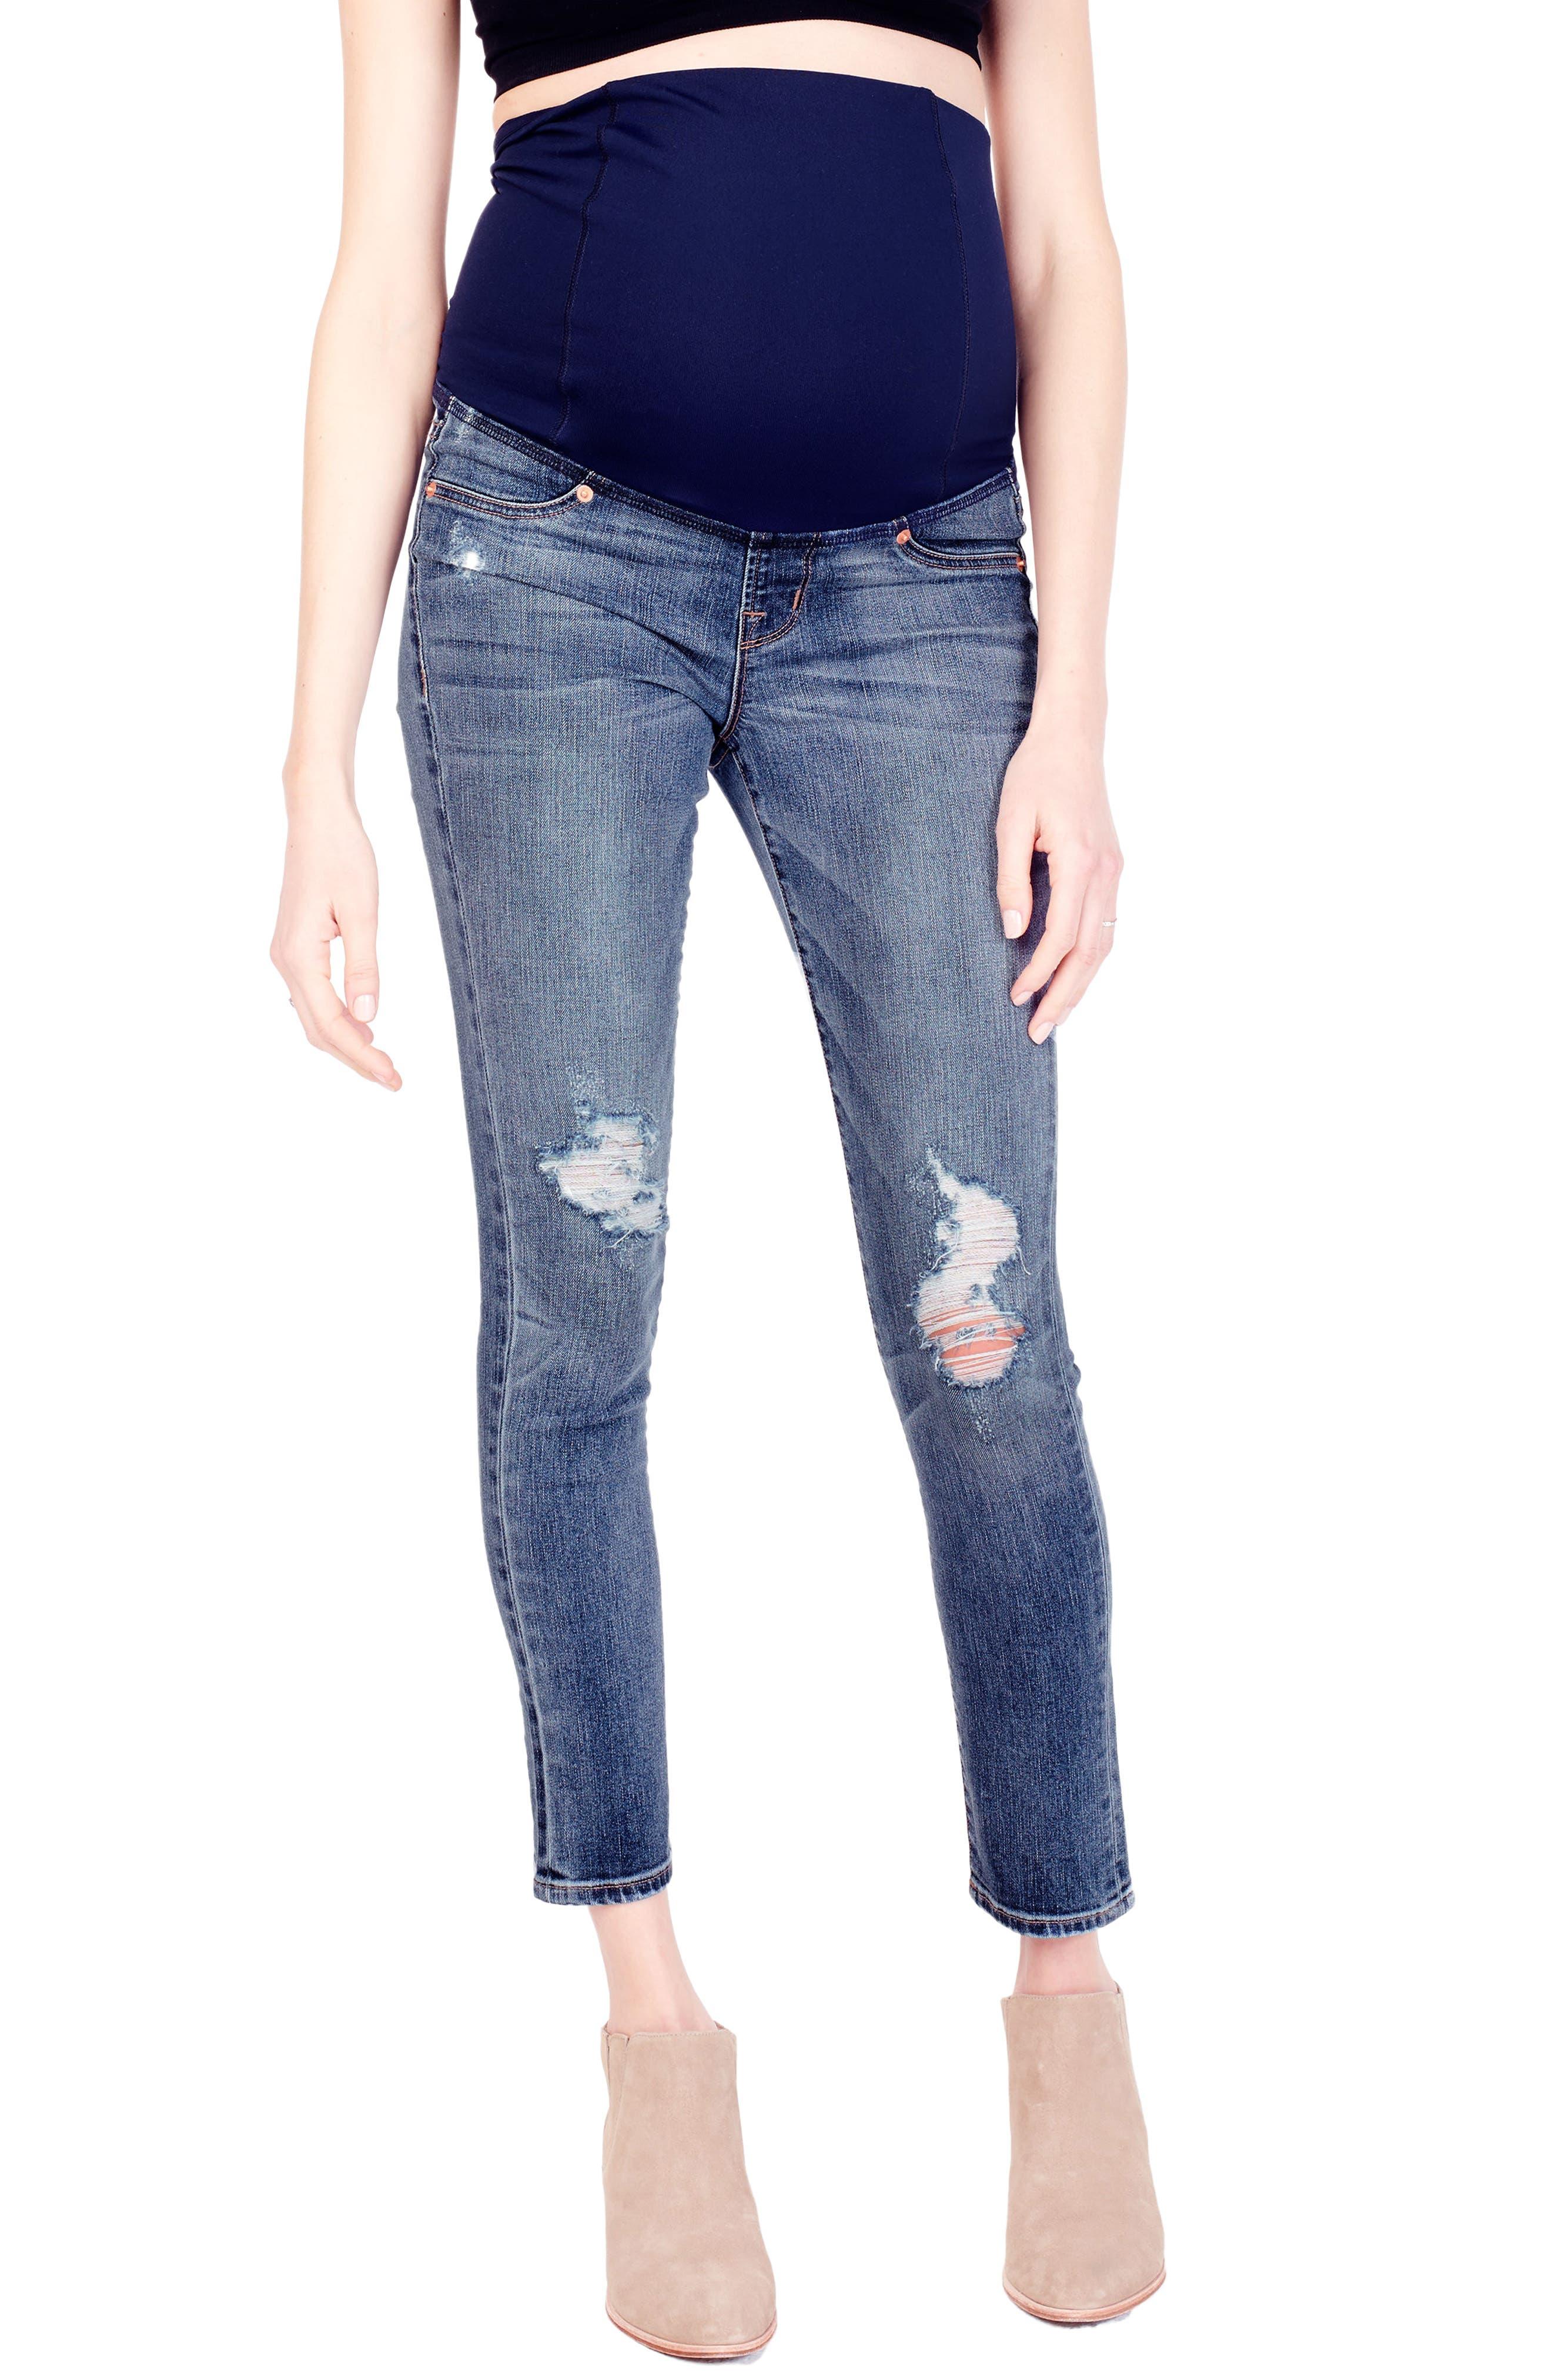 Main Image - Ingrid & Isabel® Sasha Maternity Skinny Jeans with Crossover Panel™